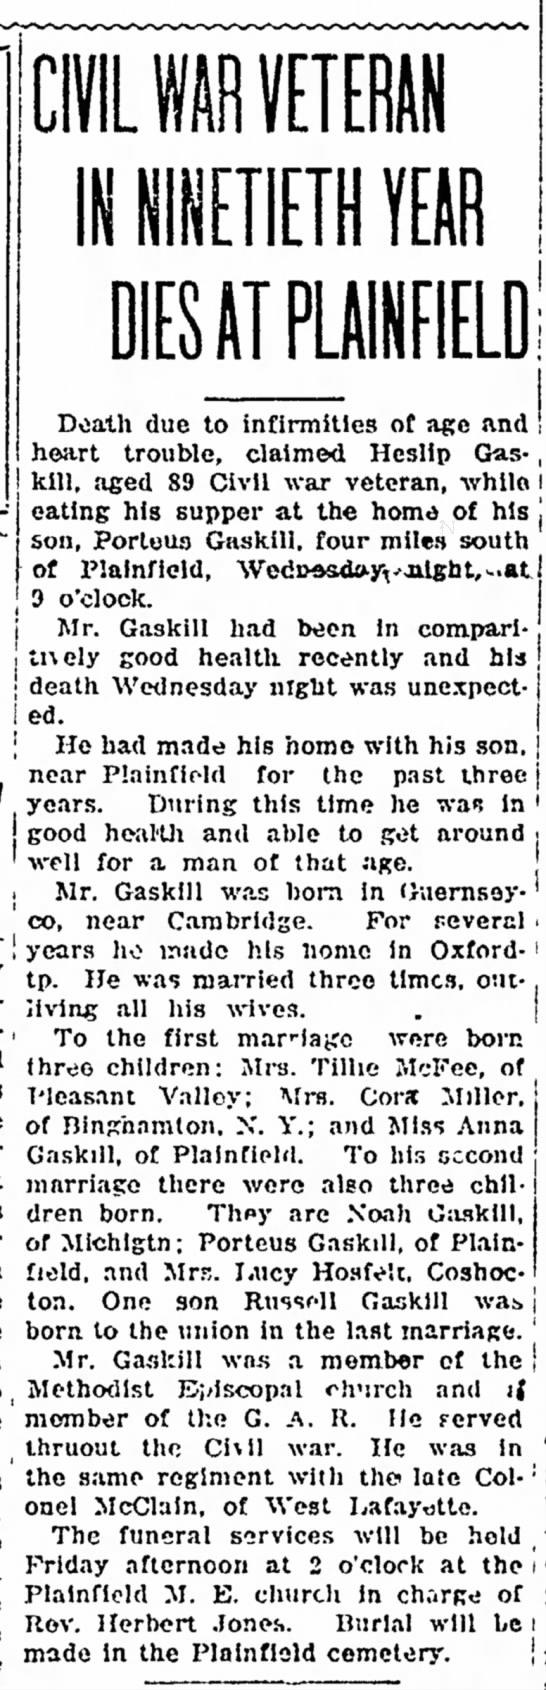 Death of Heslip Gaskill - cents than The OWL Id NINETIETH YEftR AT Doath...